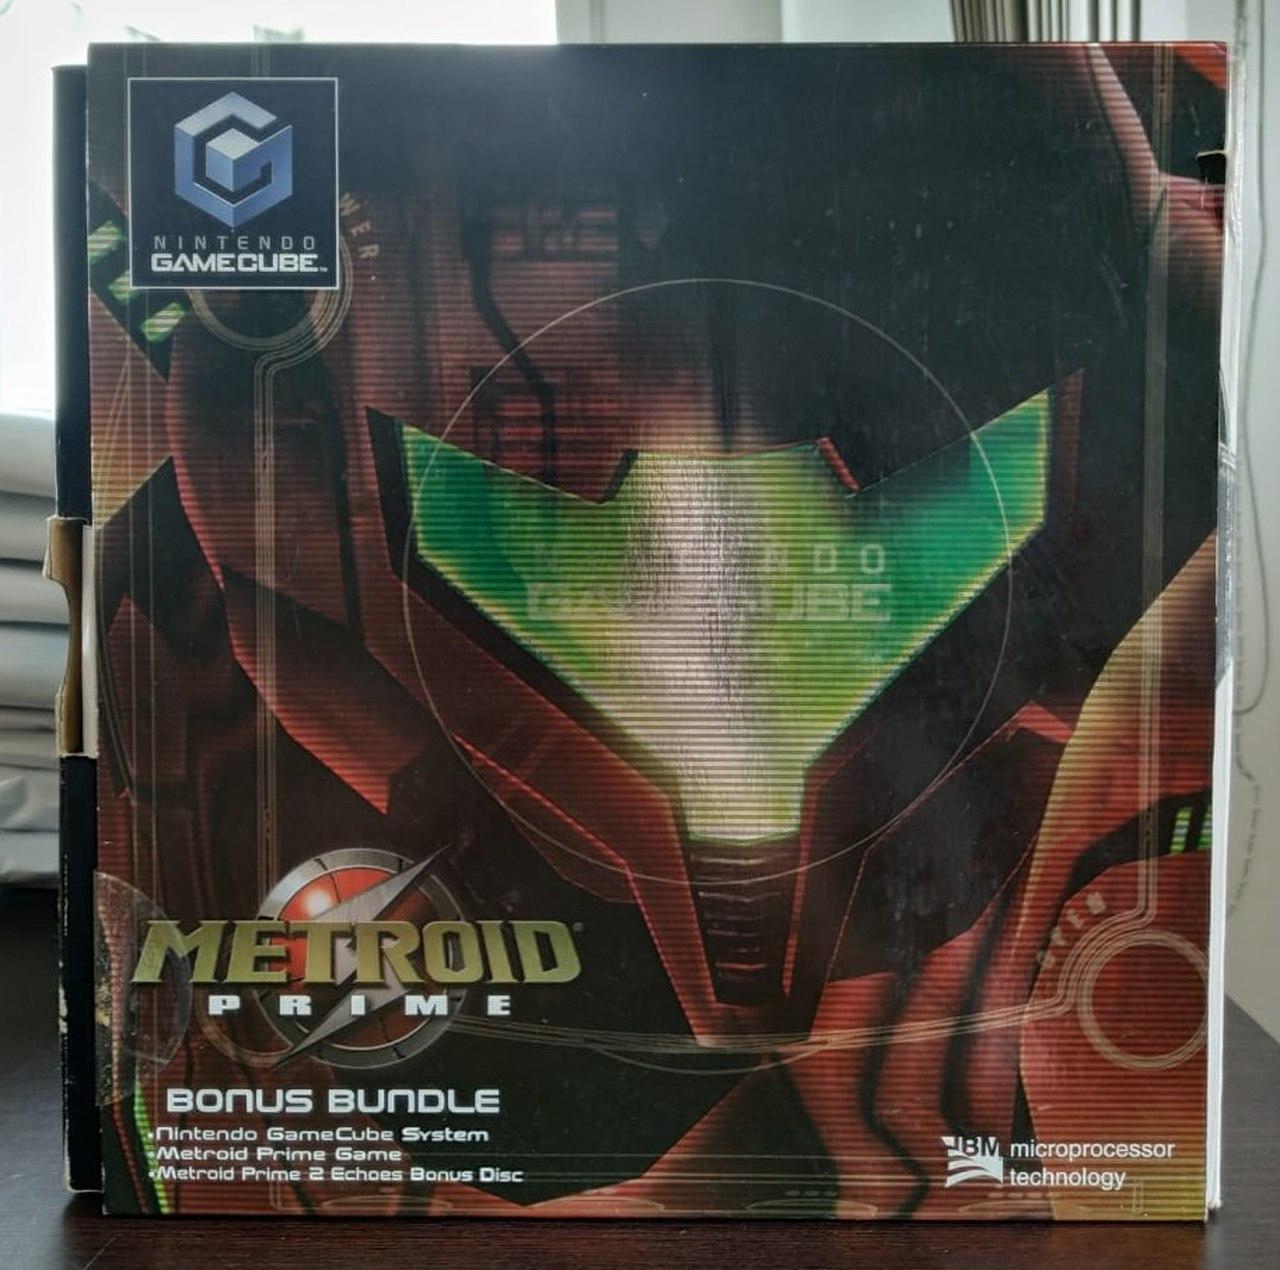 Console Nintendo GameCube + Metroid Prime Bundle - Usado